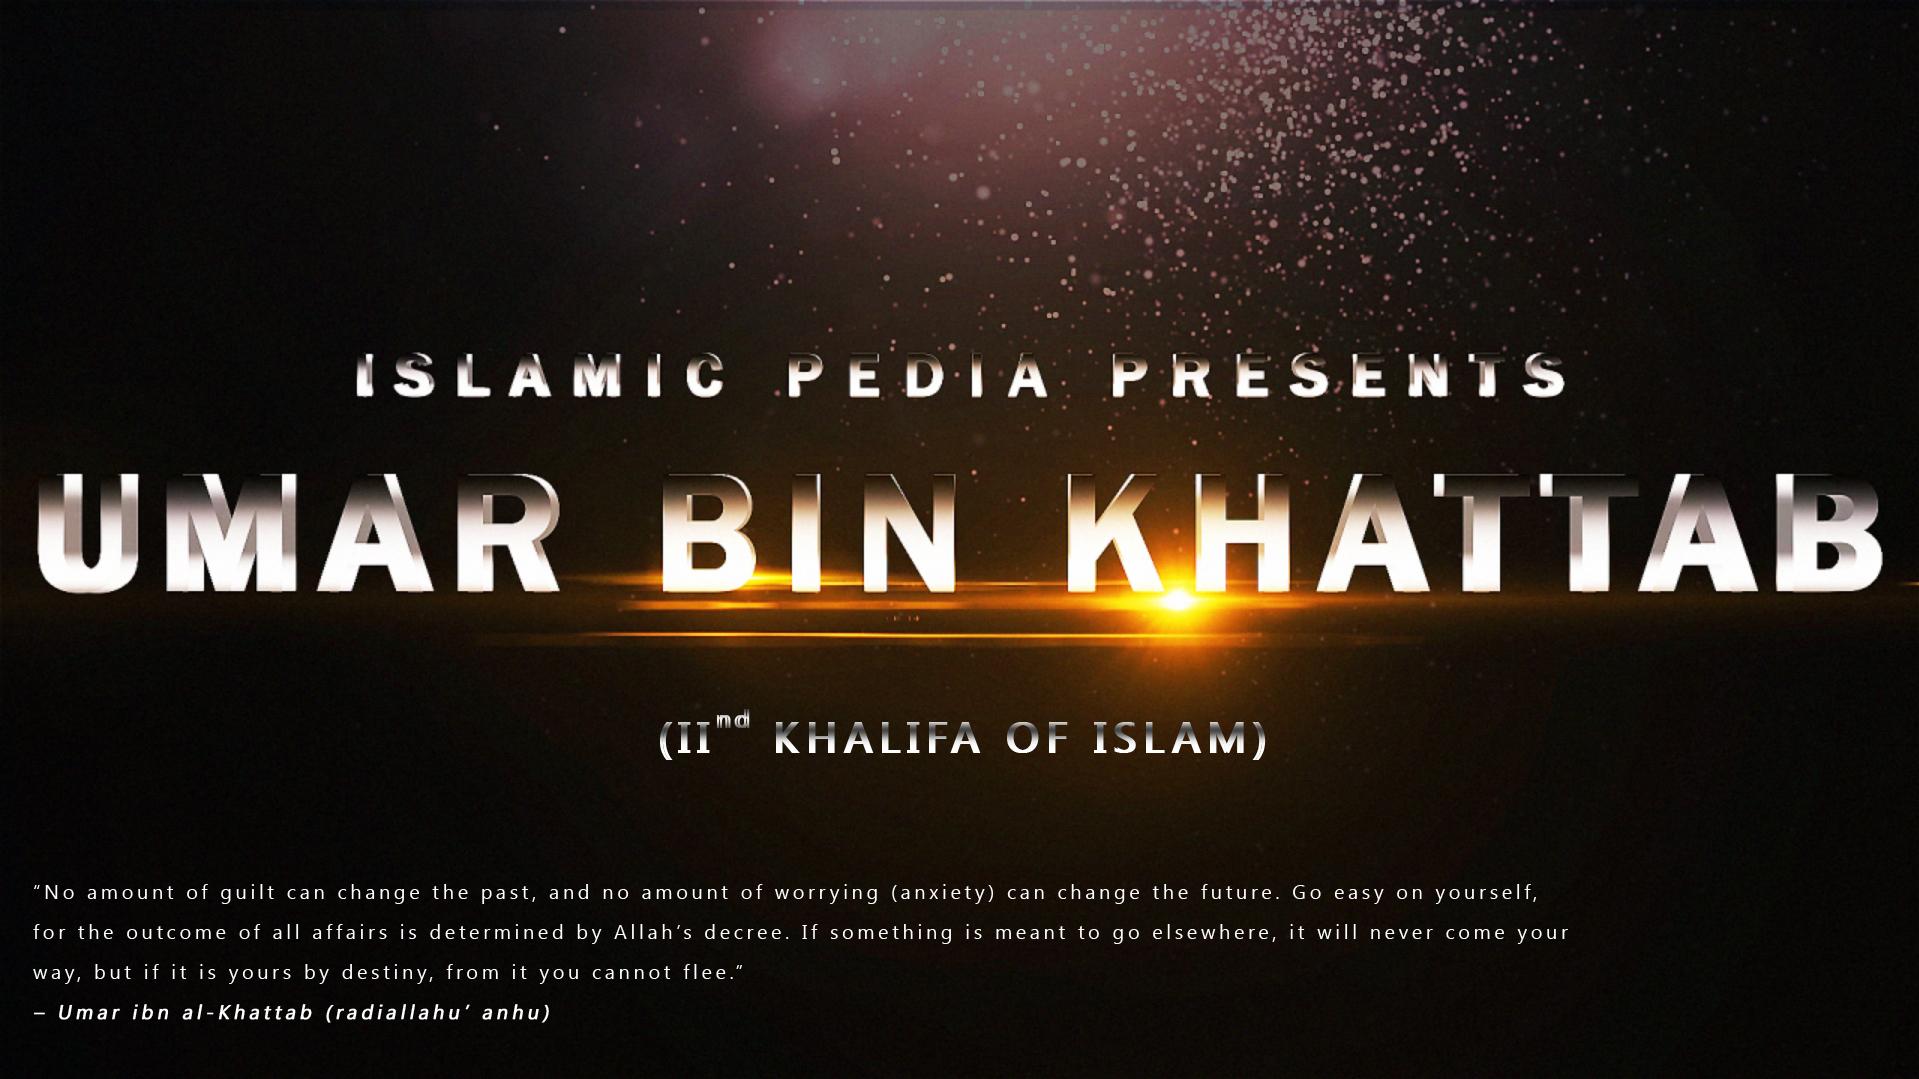 Umar series in hindi - Islamic Pedia